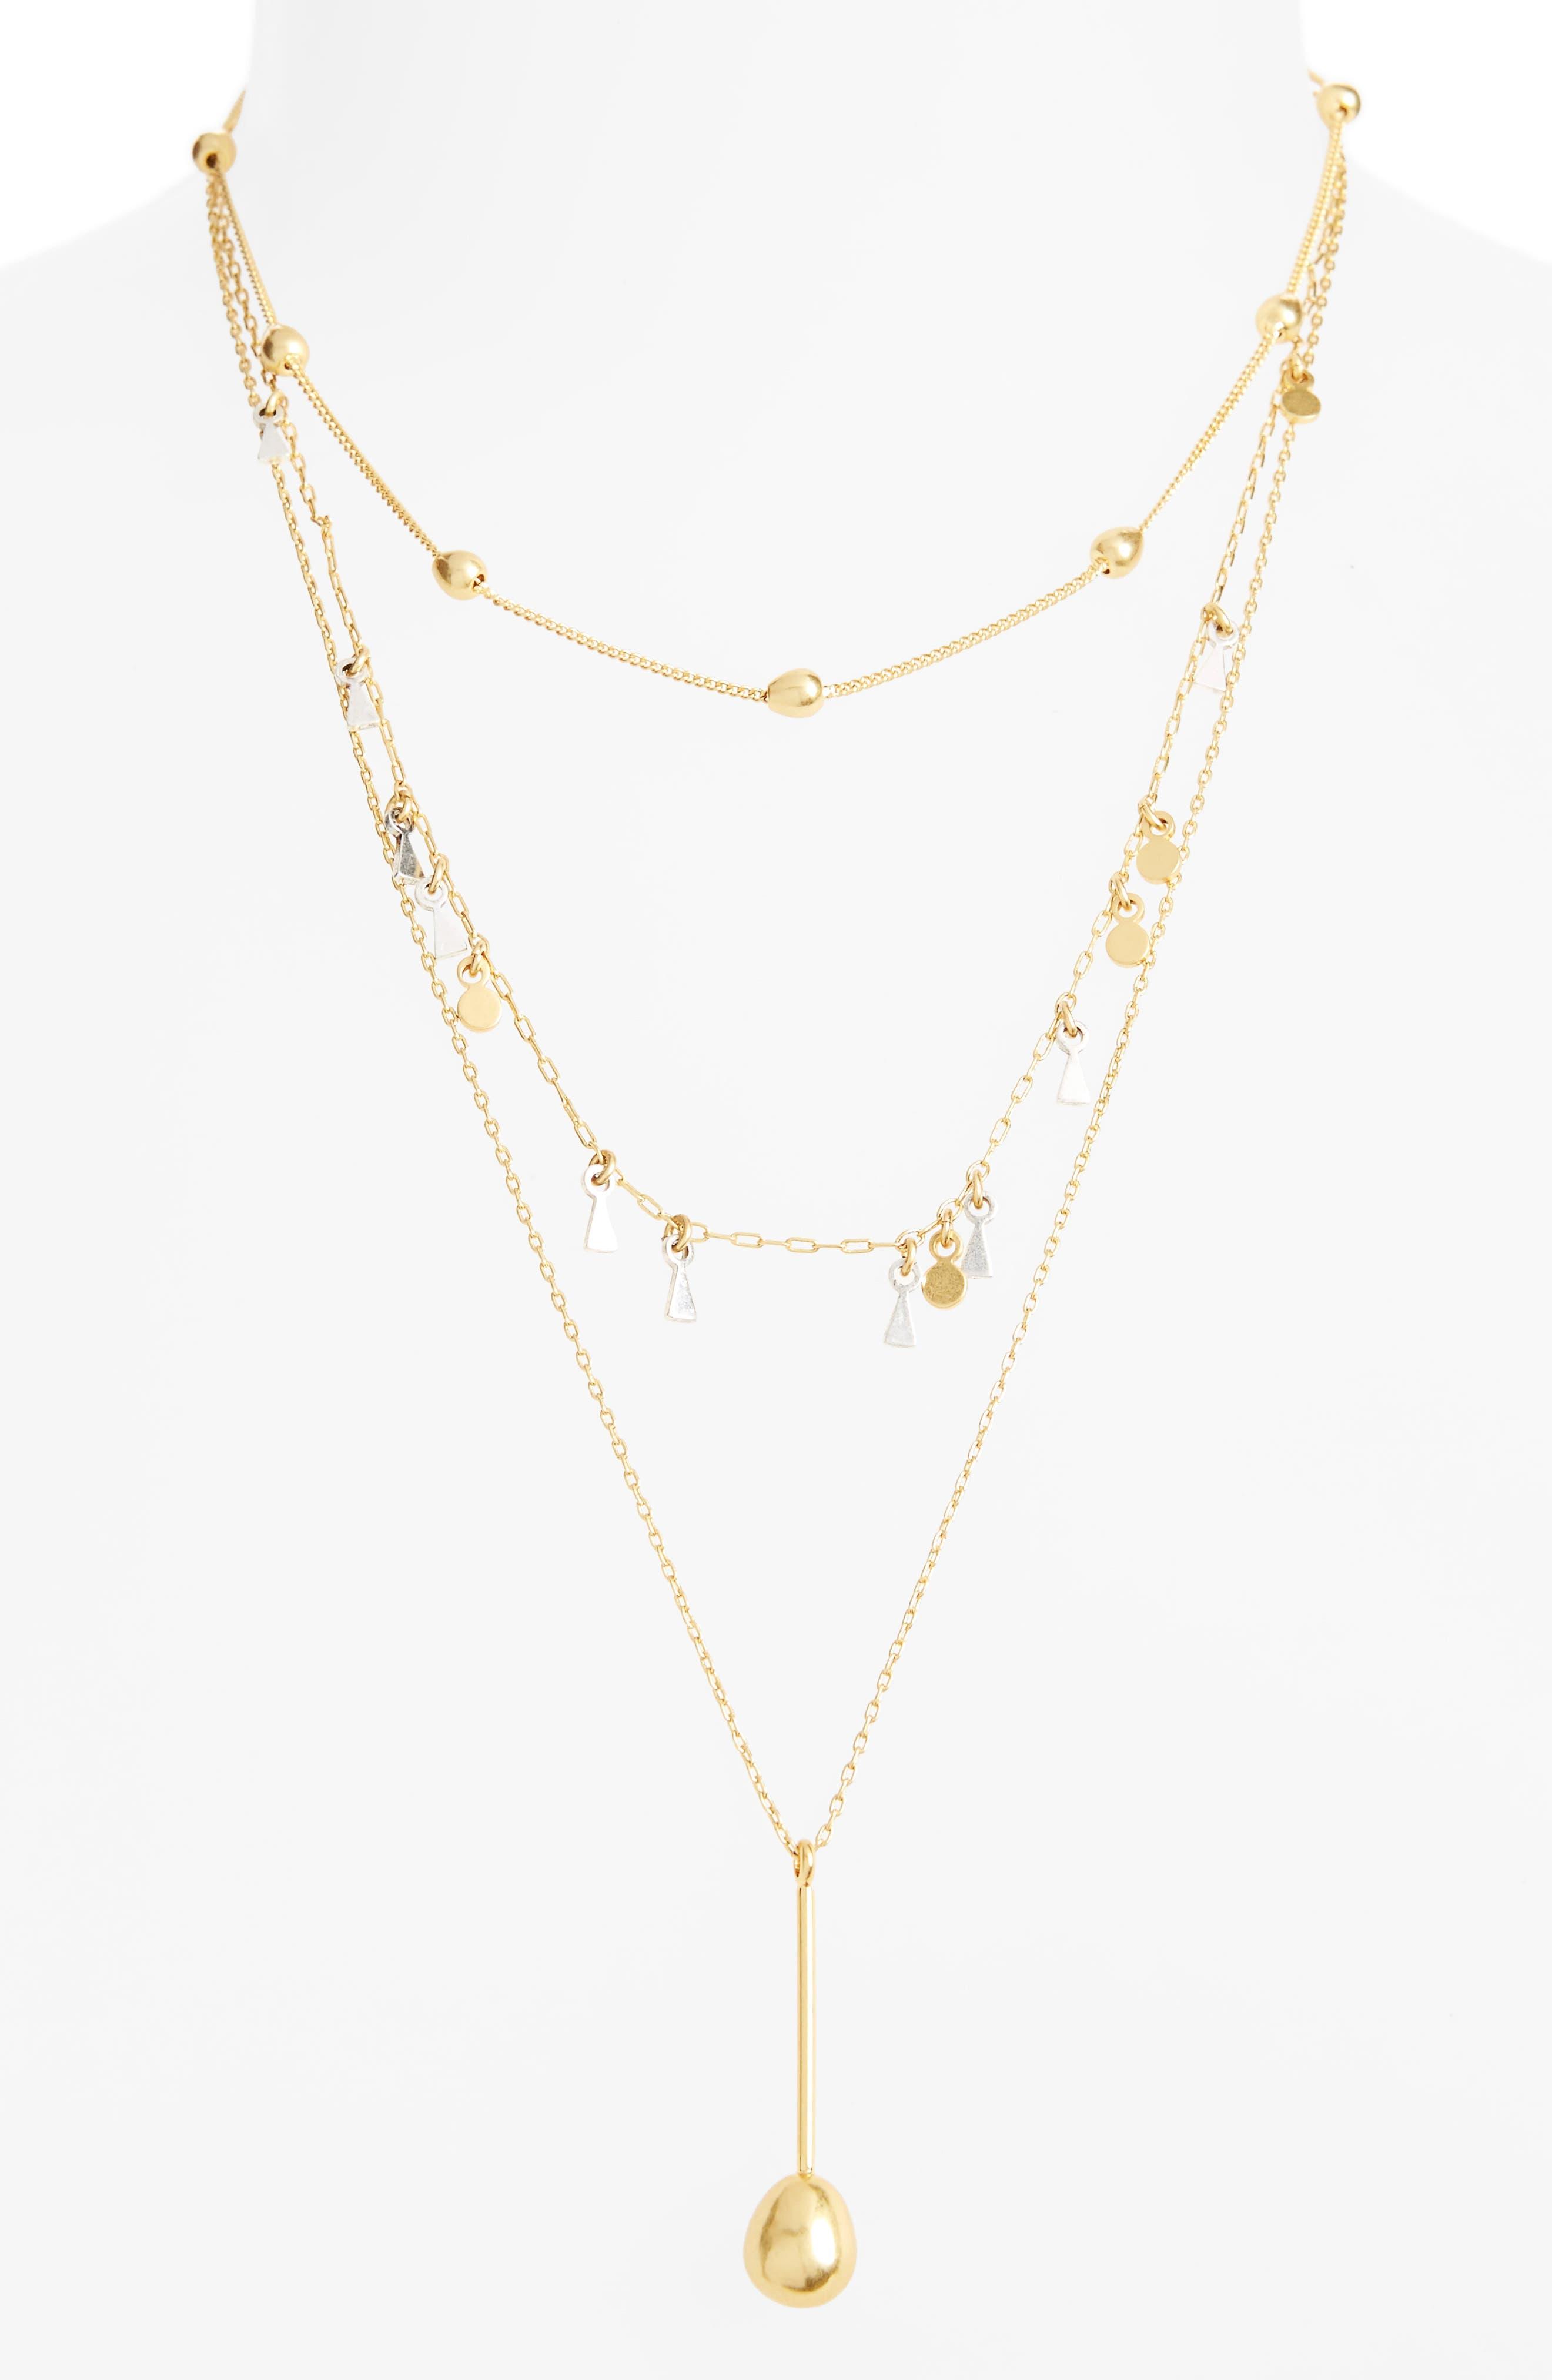 Main Image - Madewell Organic Shape Layered Necklace